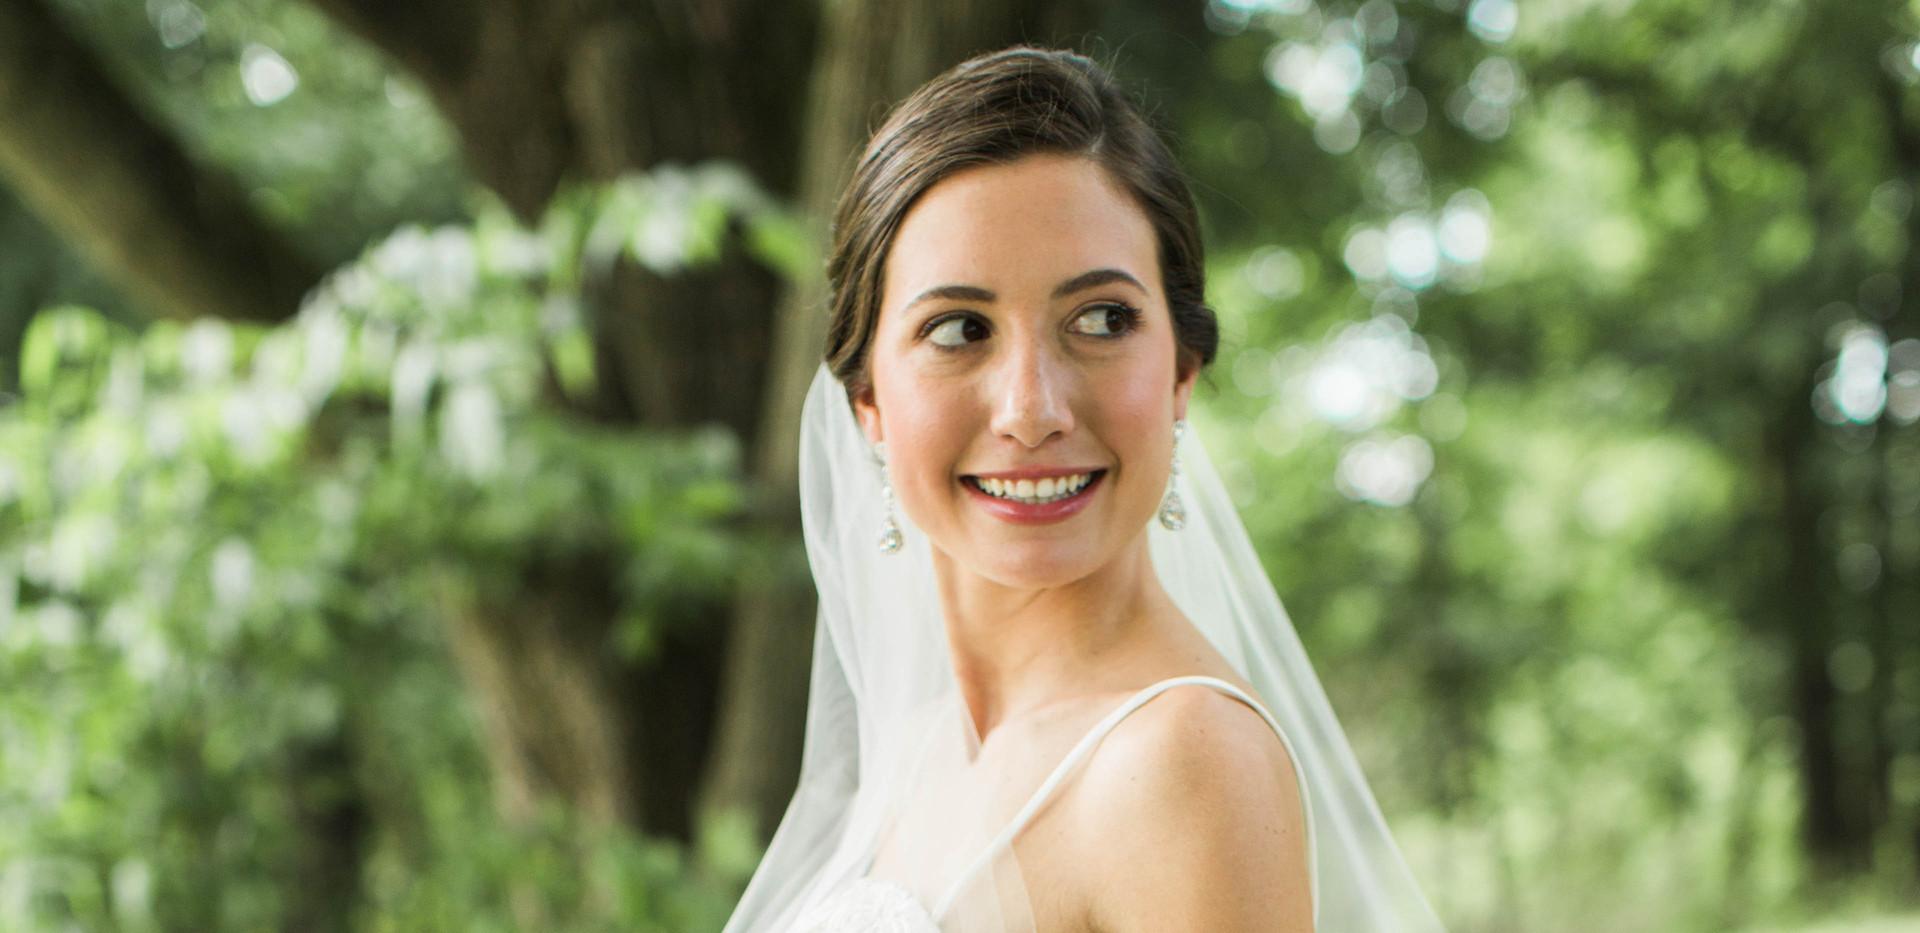 Bride2-make-up-by-Sonnie-Baltimore-Maryland.jpg